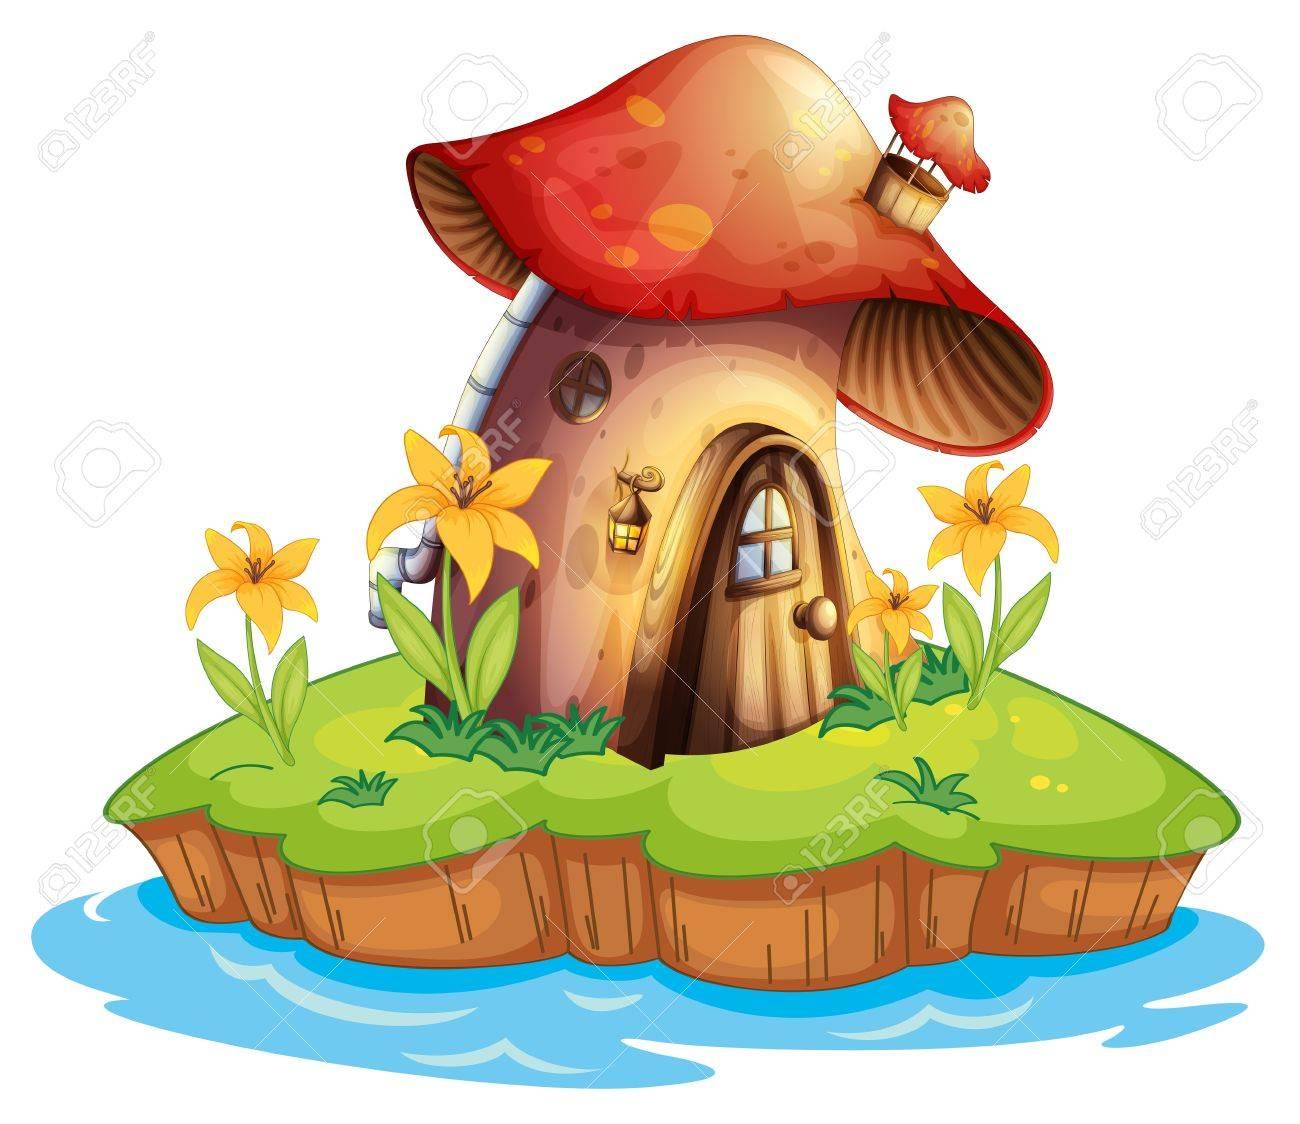 Illustration Of A Mushroom House On White Background